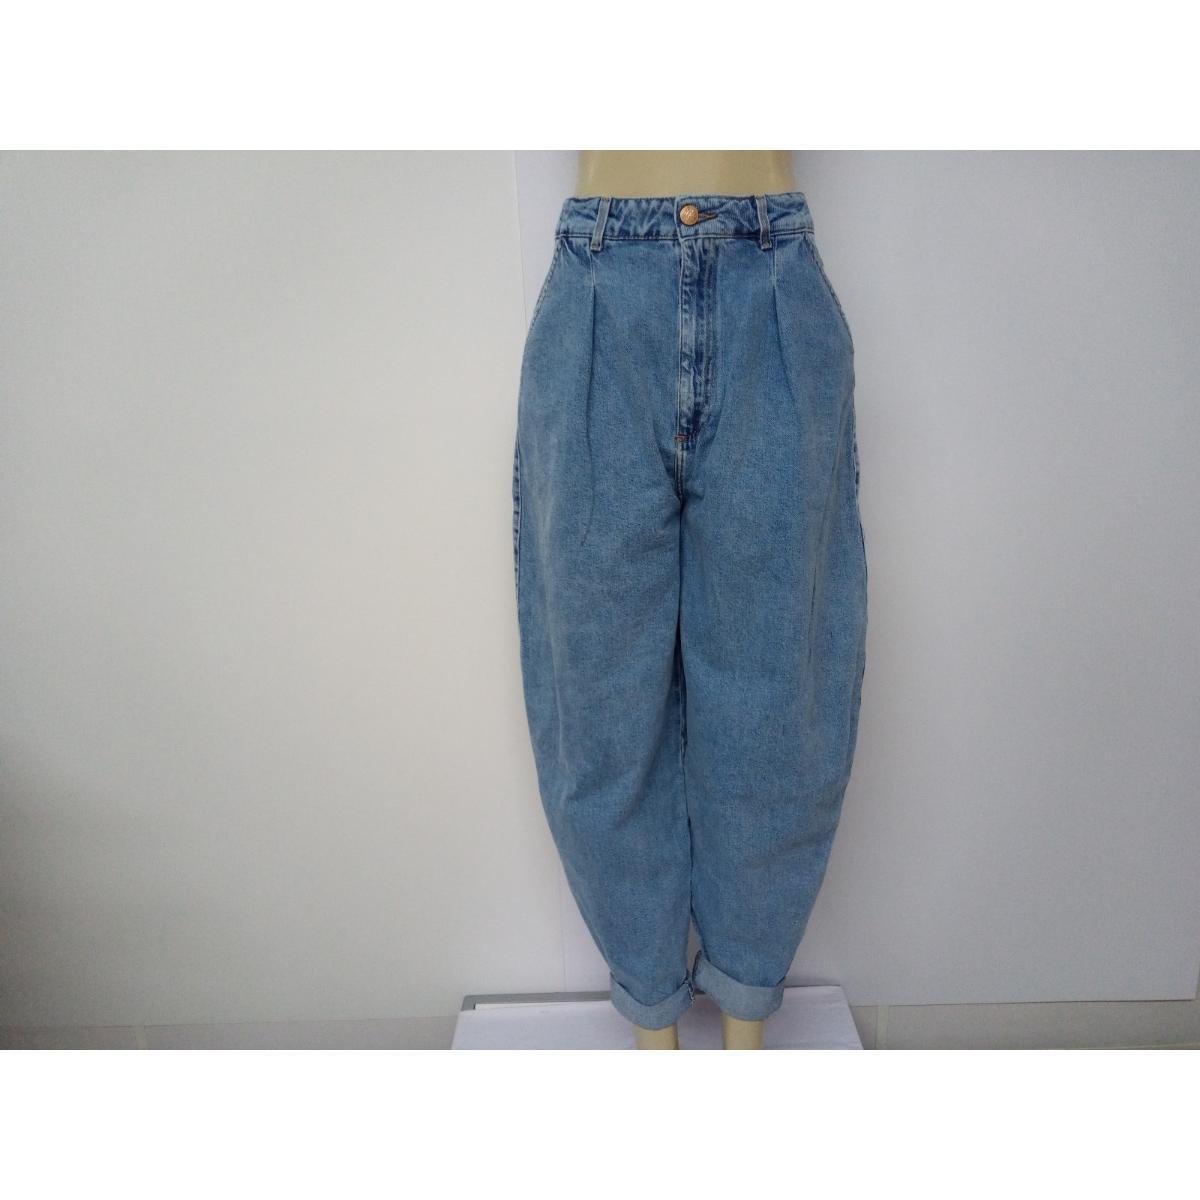 Calça Feminina Index 01.01.1004867 Jeans